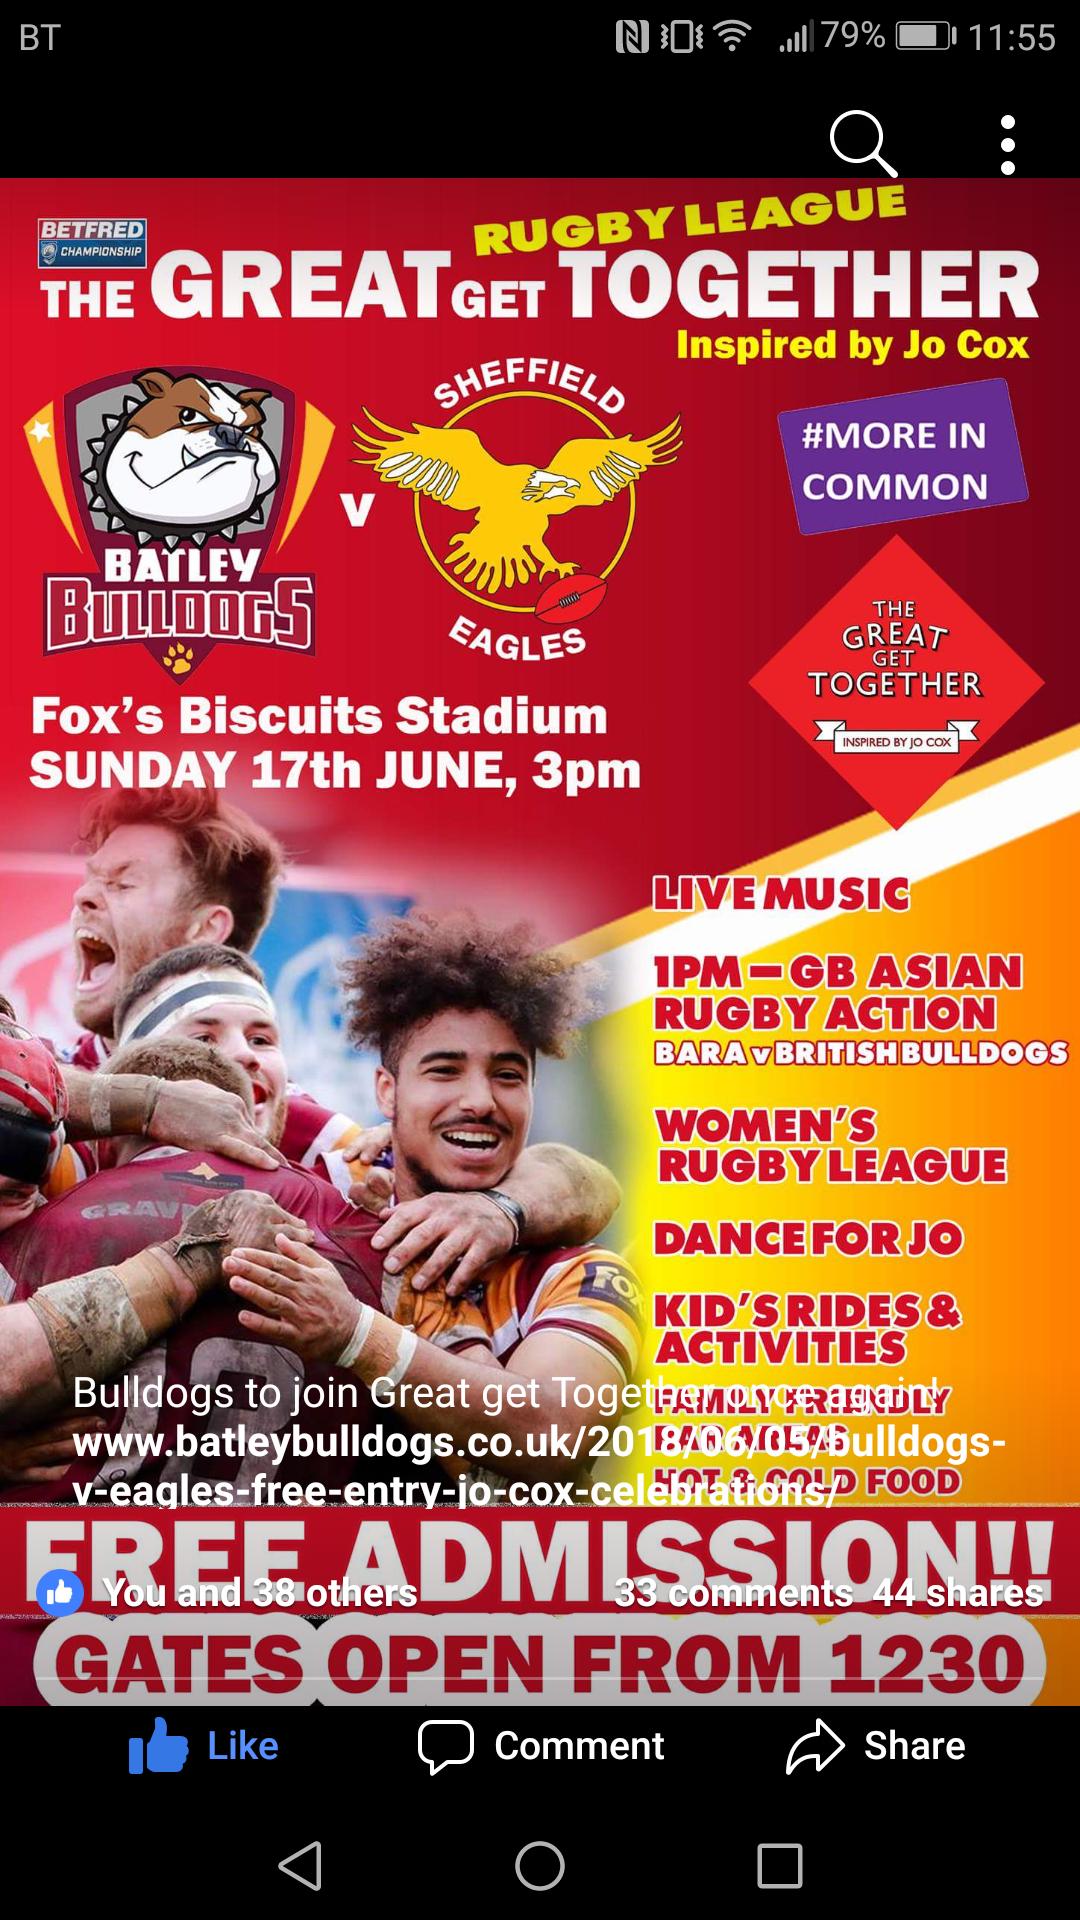 Free Rugby League - Batley Bulldogs v Sheffield Eagles